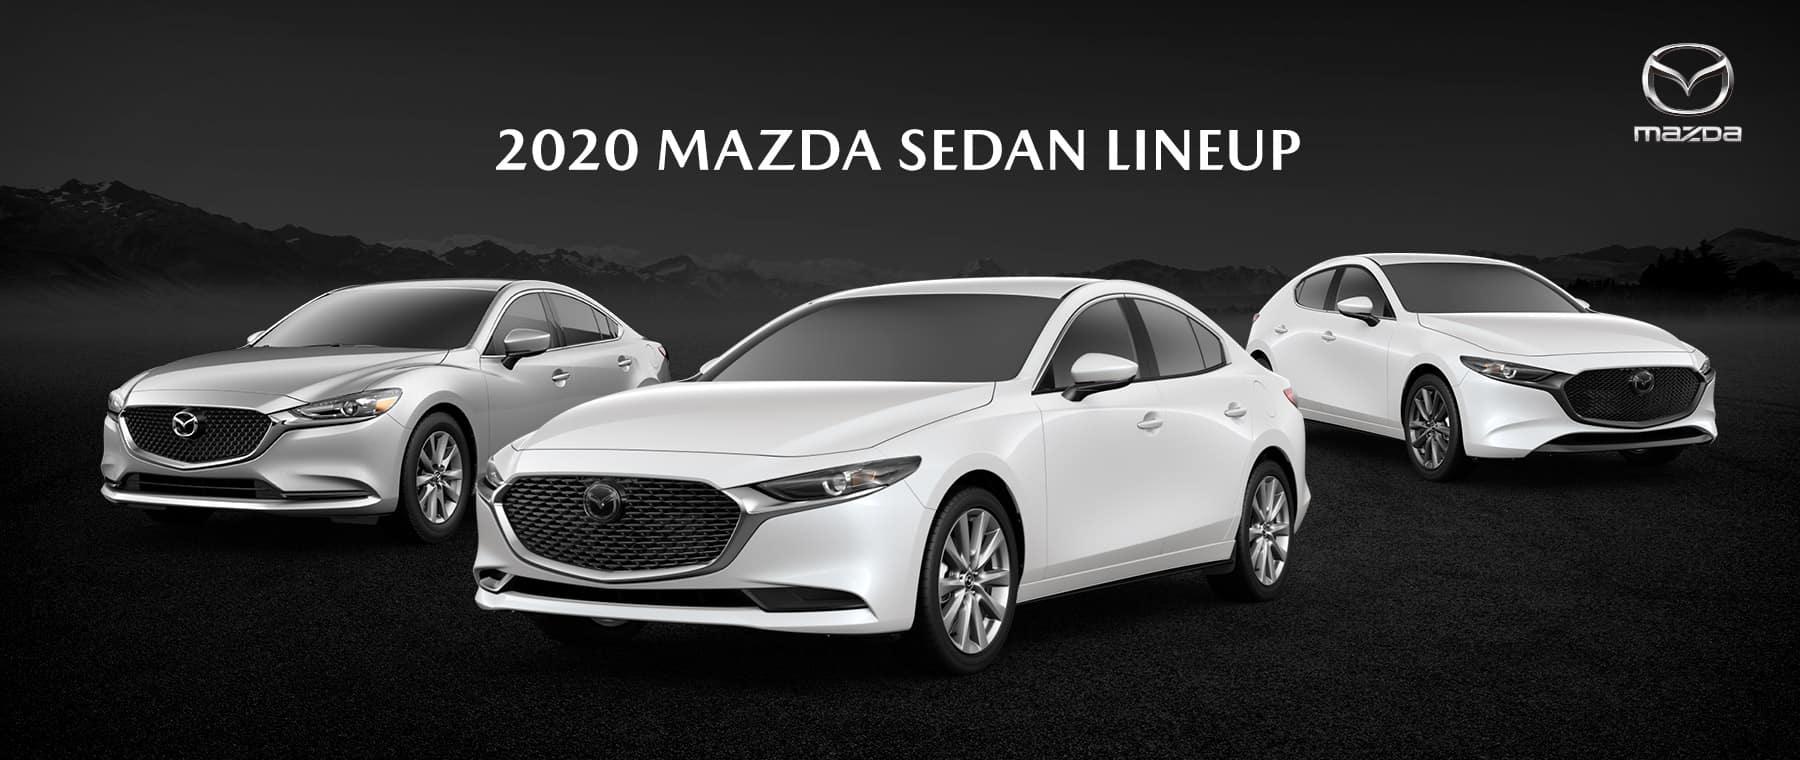 2020 Mazda Sedan Lineup - Bert Ogden Mission Mazda - Mission, TX